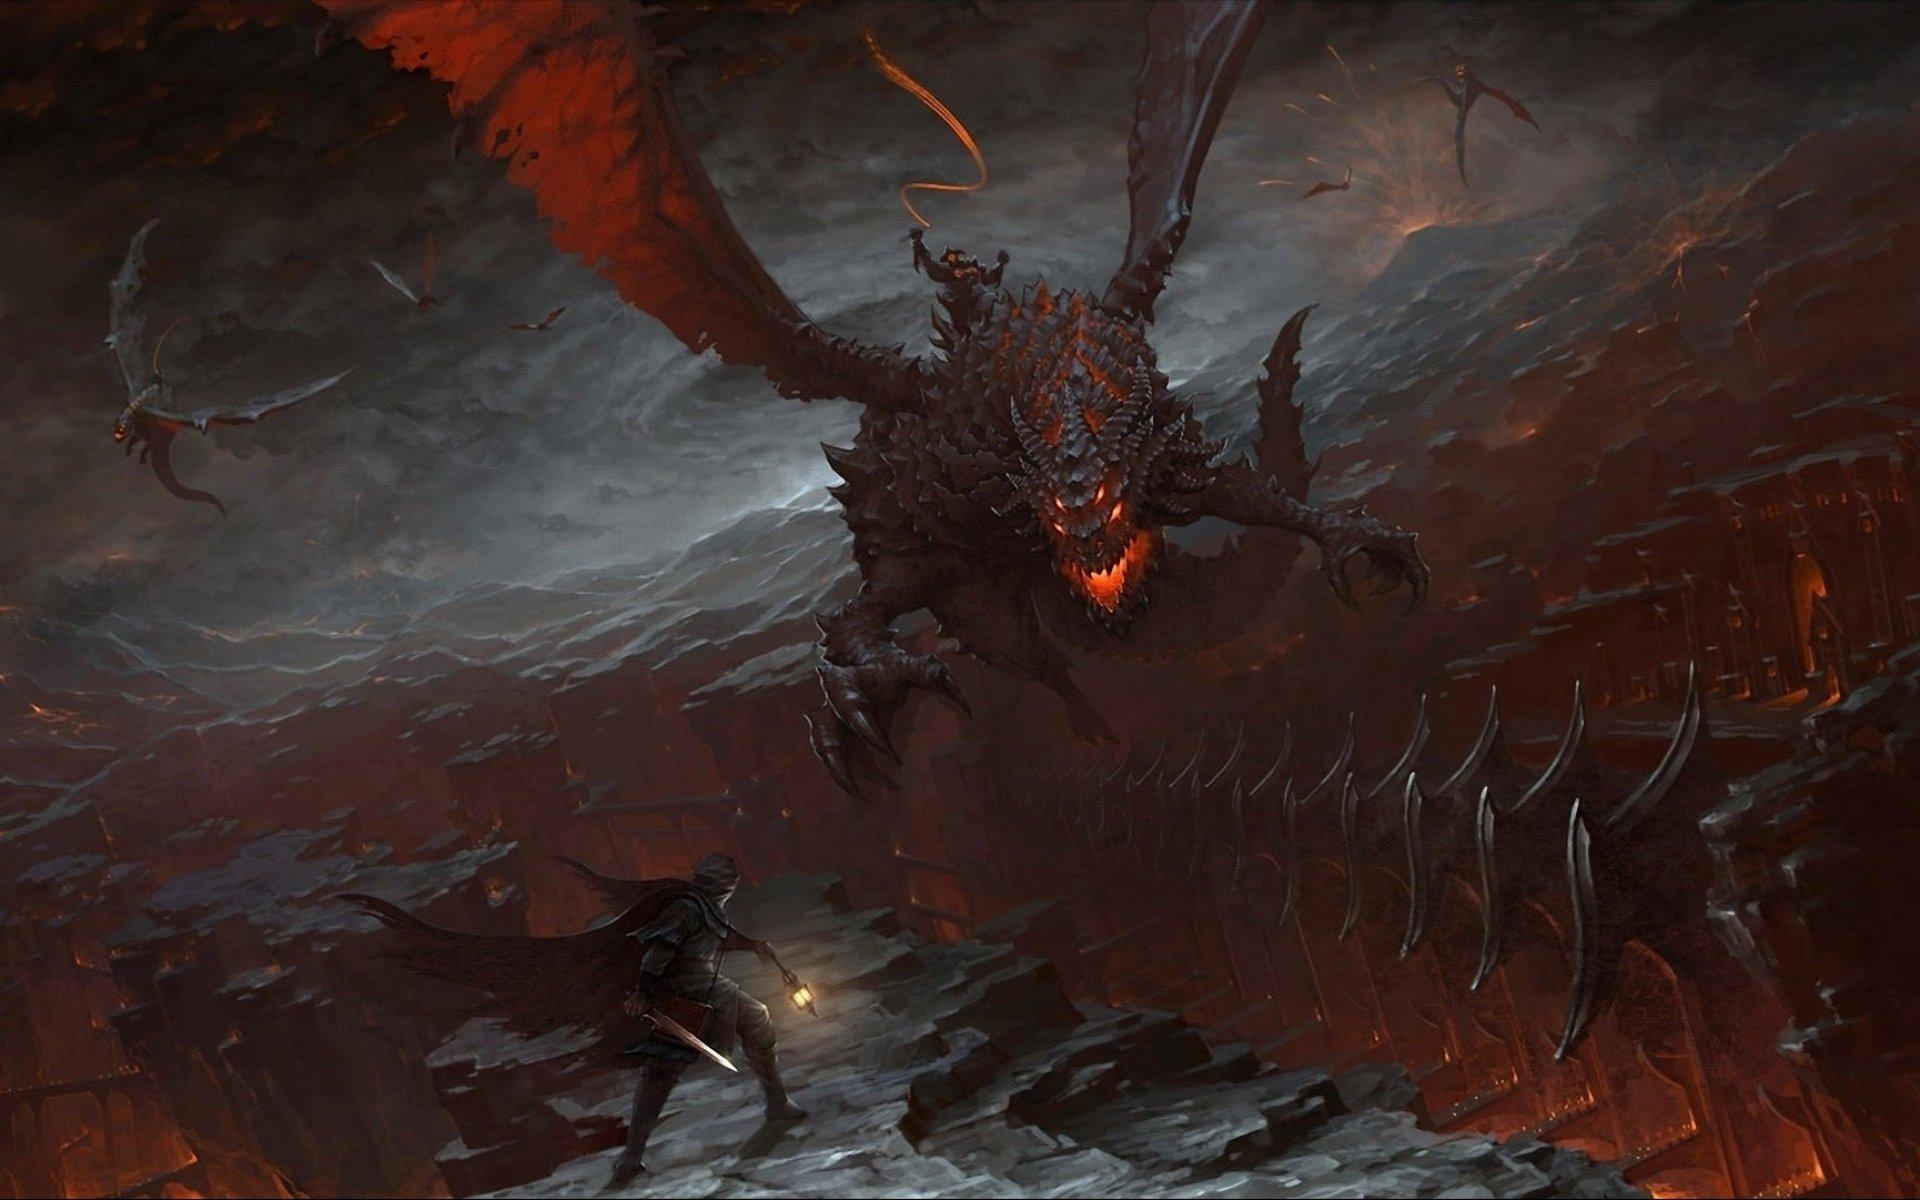 dragons fantasy wallpaper 1920x1200 - photo #17